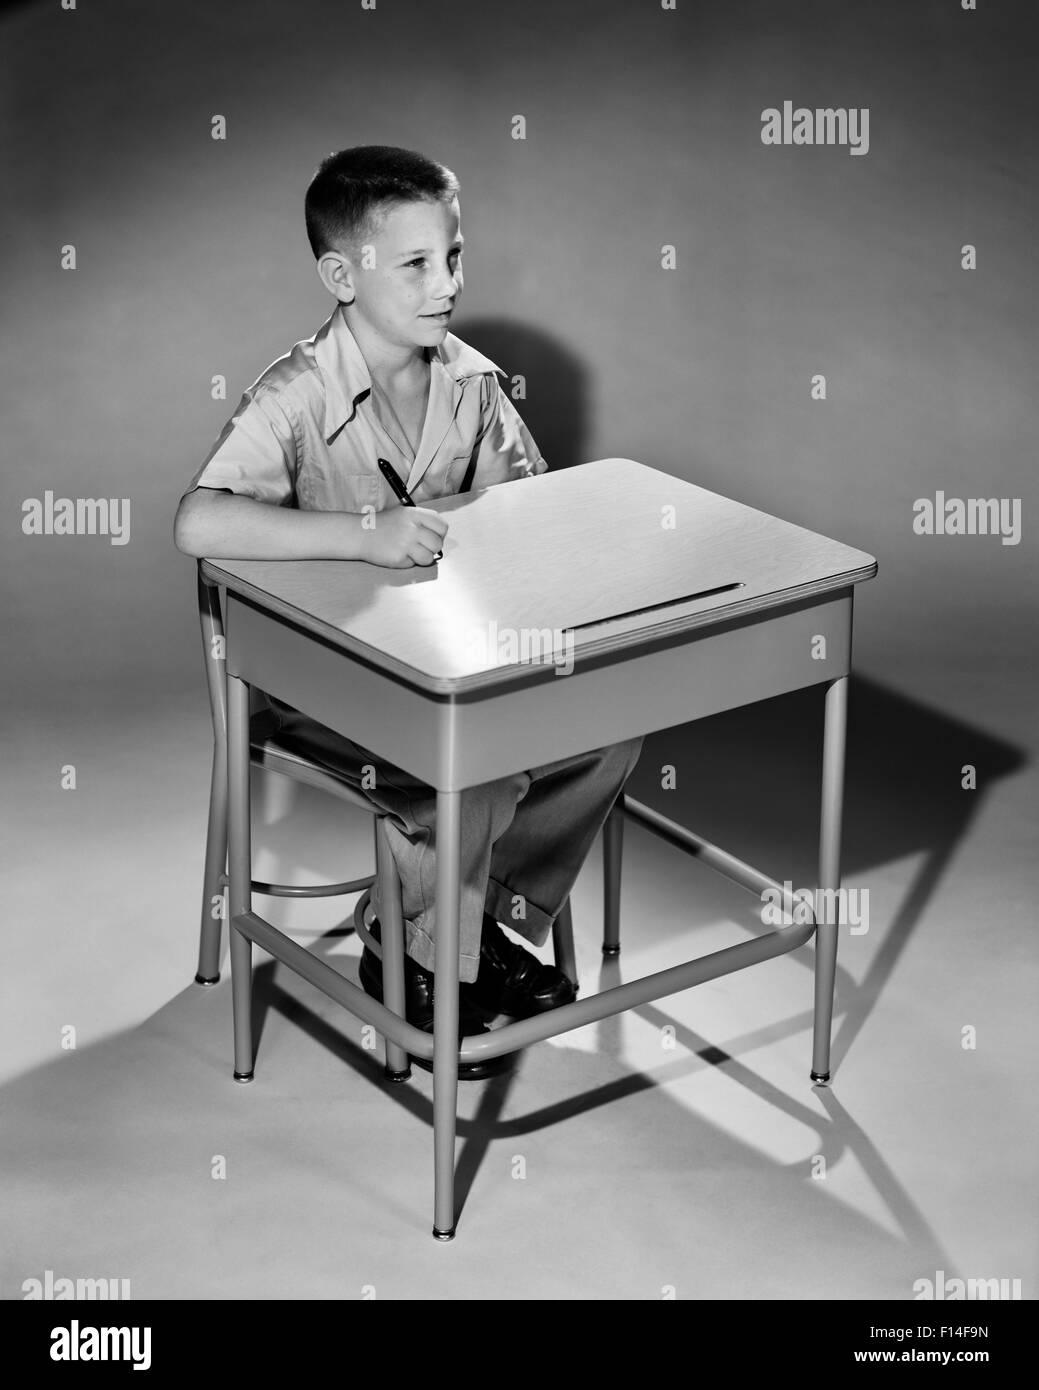 1950s classroom stockfotos 1950s classroom bilder alamy for Schreibtisch grundschule